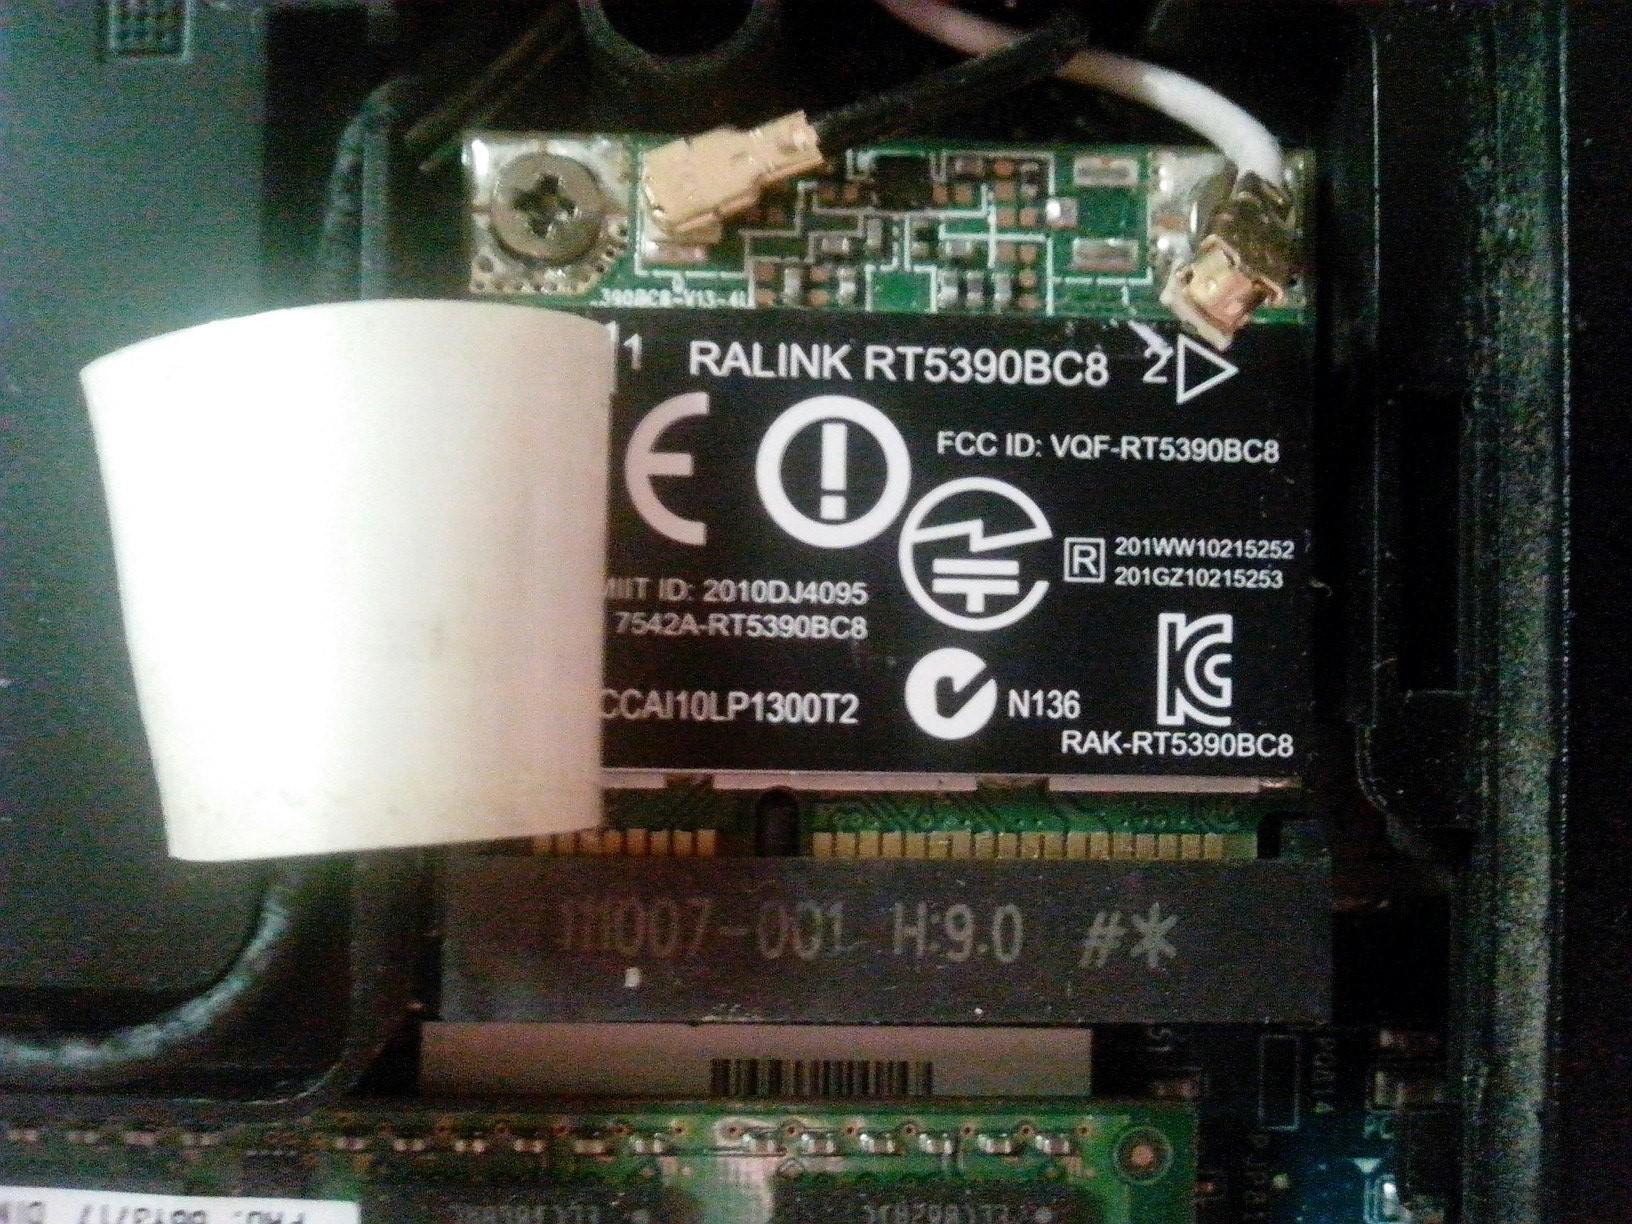 HP Pavilion dv6-6b56er: module WLAN 5 GHz for HP Pavilion